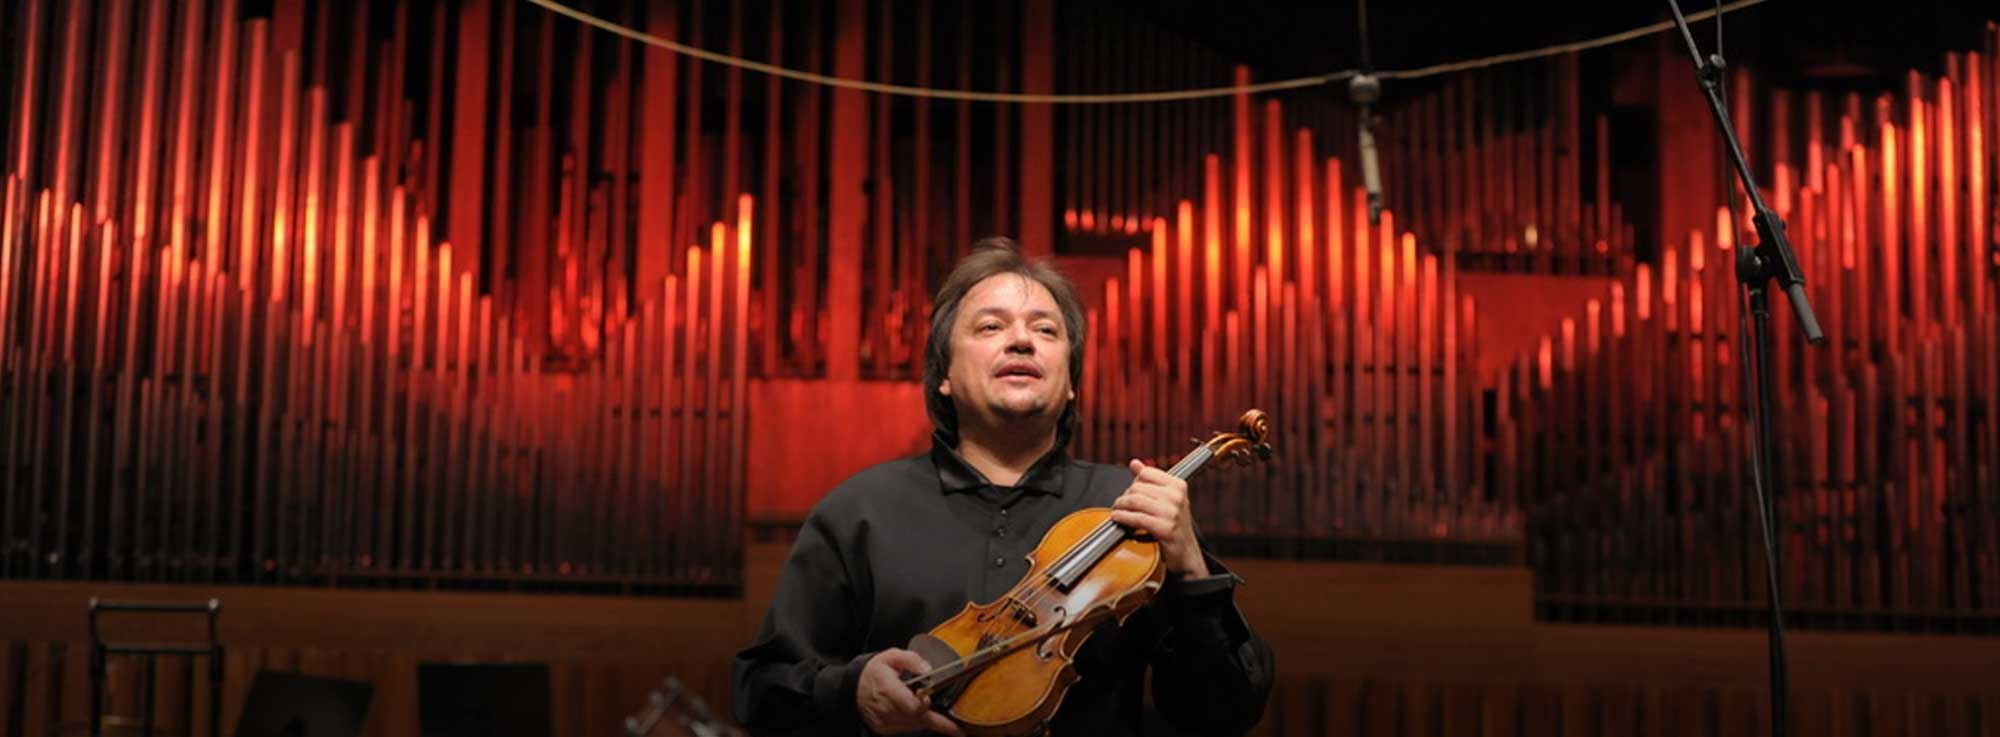 Taranto: Krylov e Strabbioli: concerto musica classica